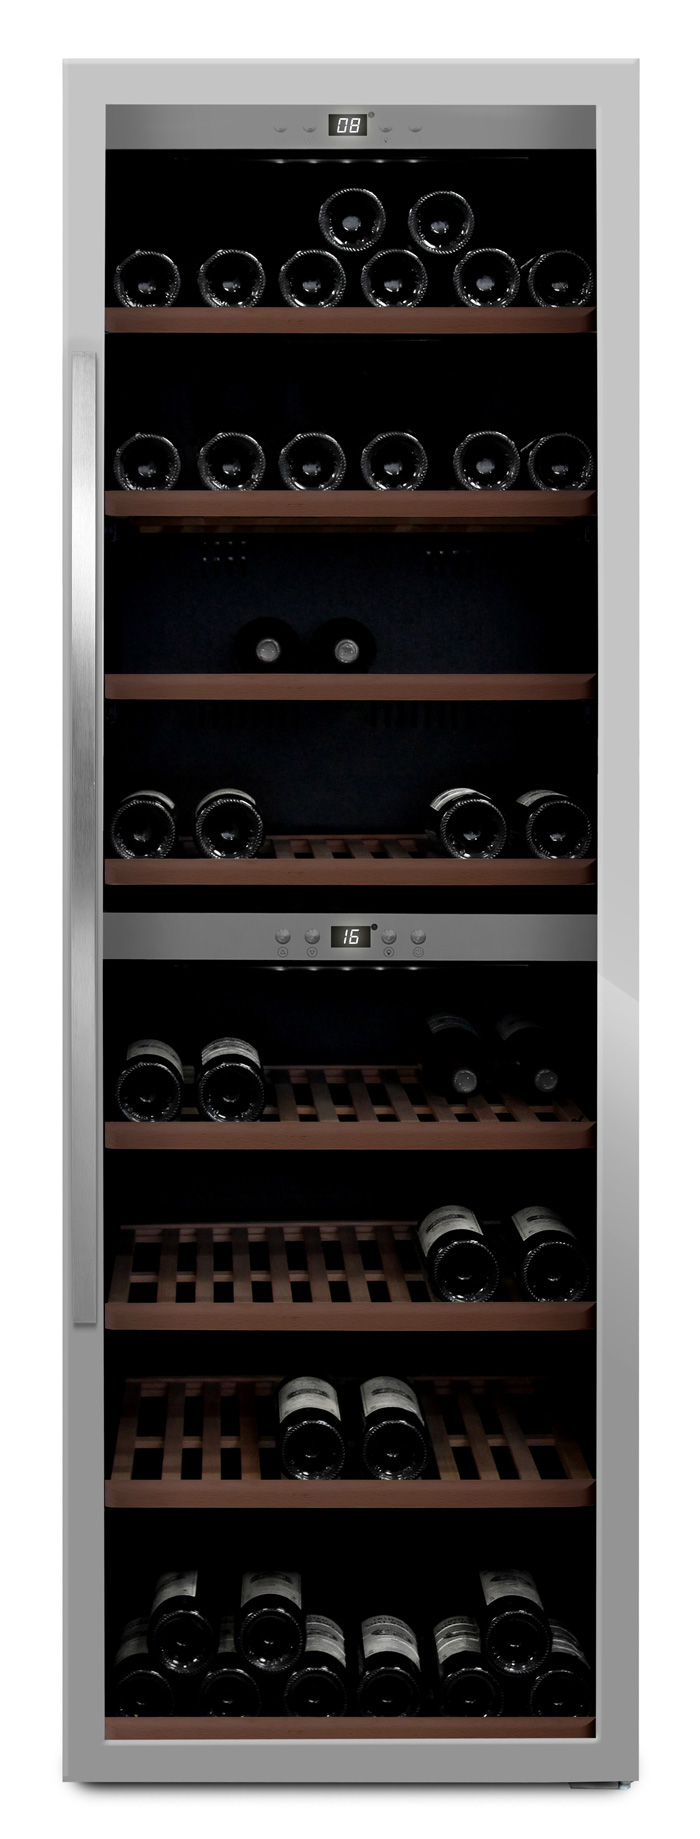 mQuvée - rostfri fristående vinkyl - rymmer 180 flaskor